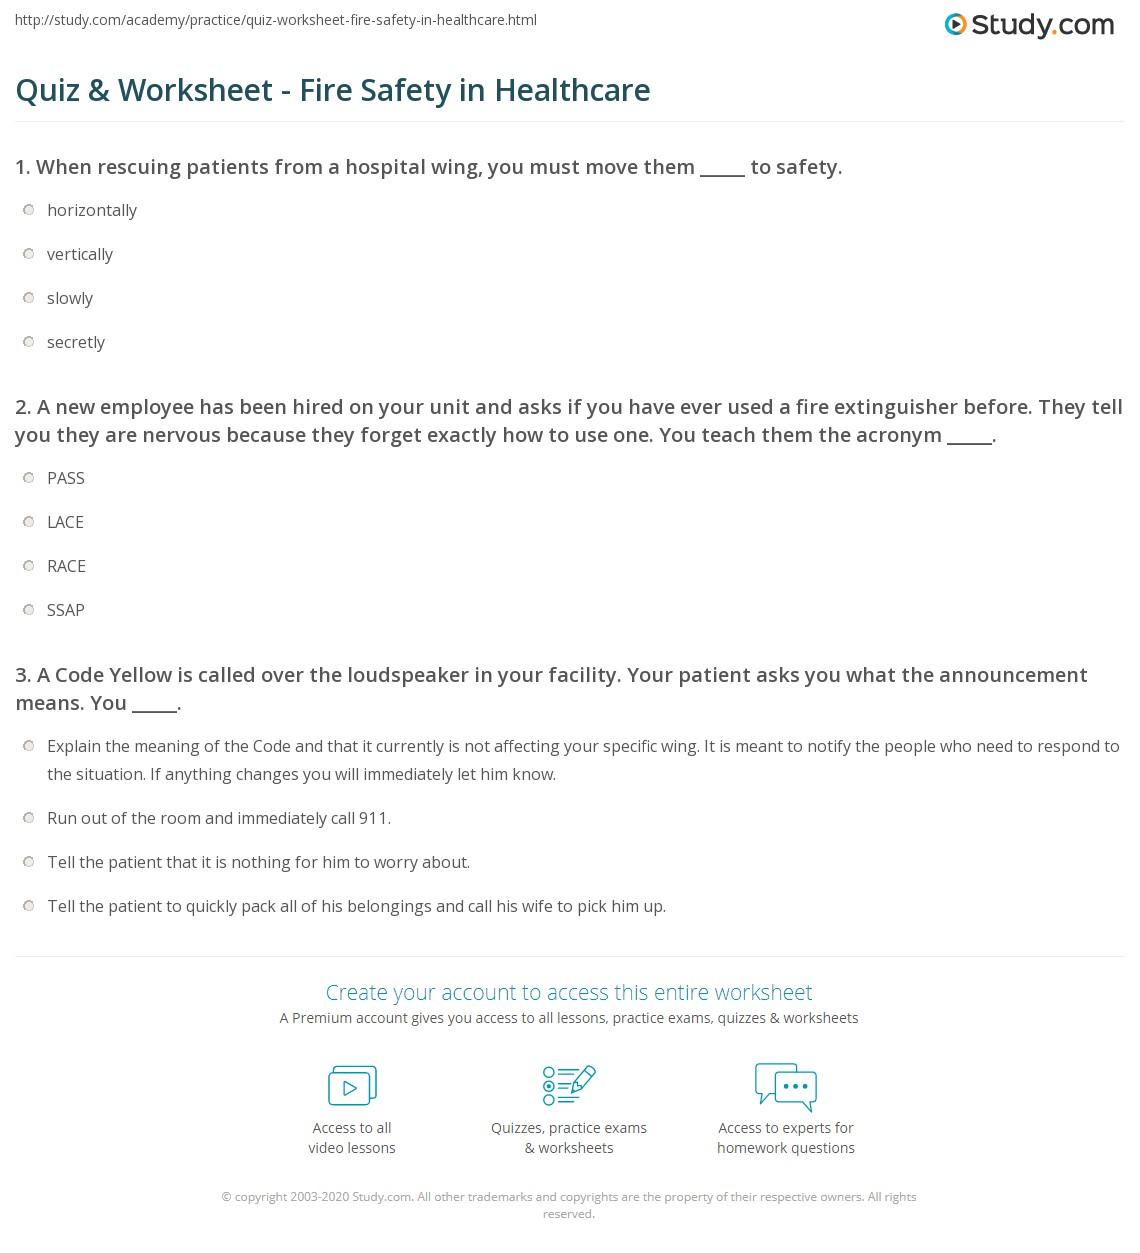 Worksheet Fire Safety Worksheet Worksheet Fun Worksheet